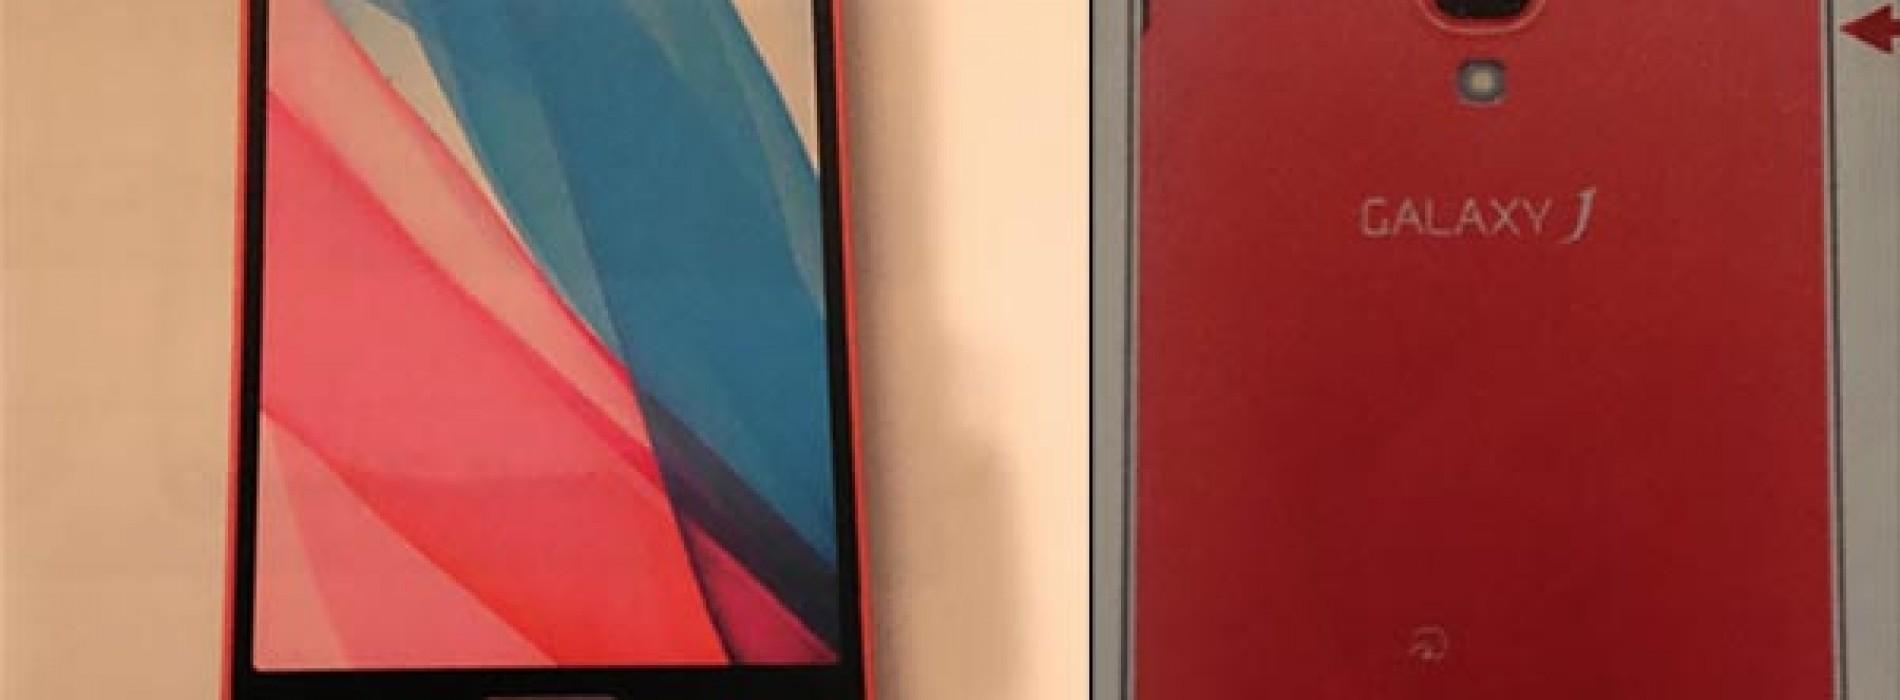 5-inch Samsung Galaxy J headed for Japan, leak indicates